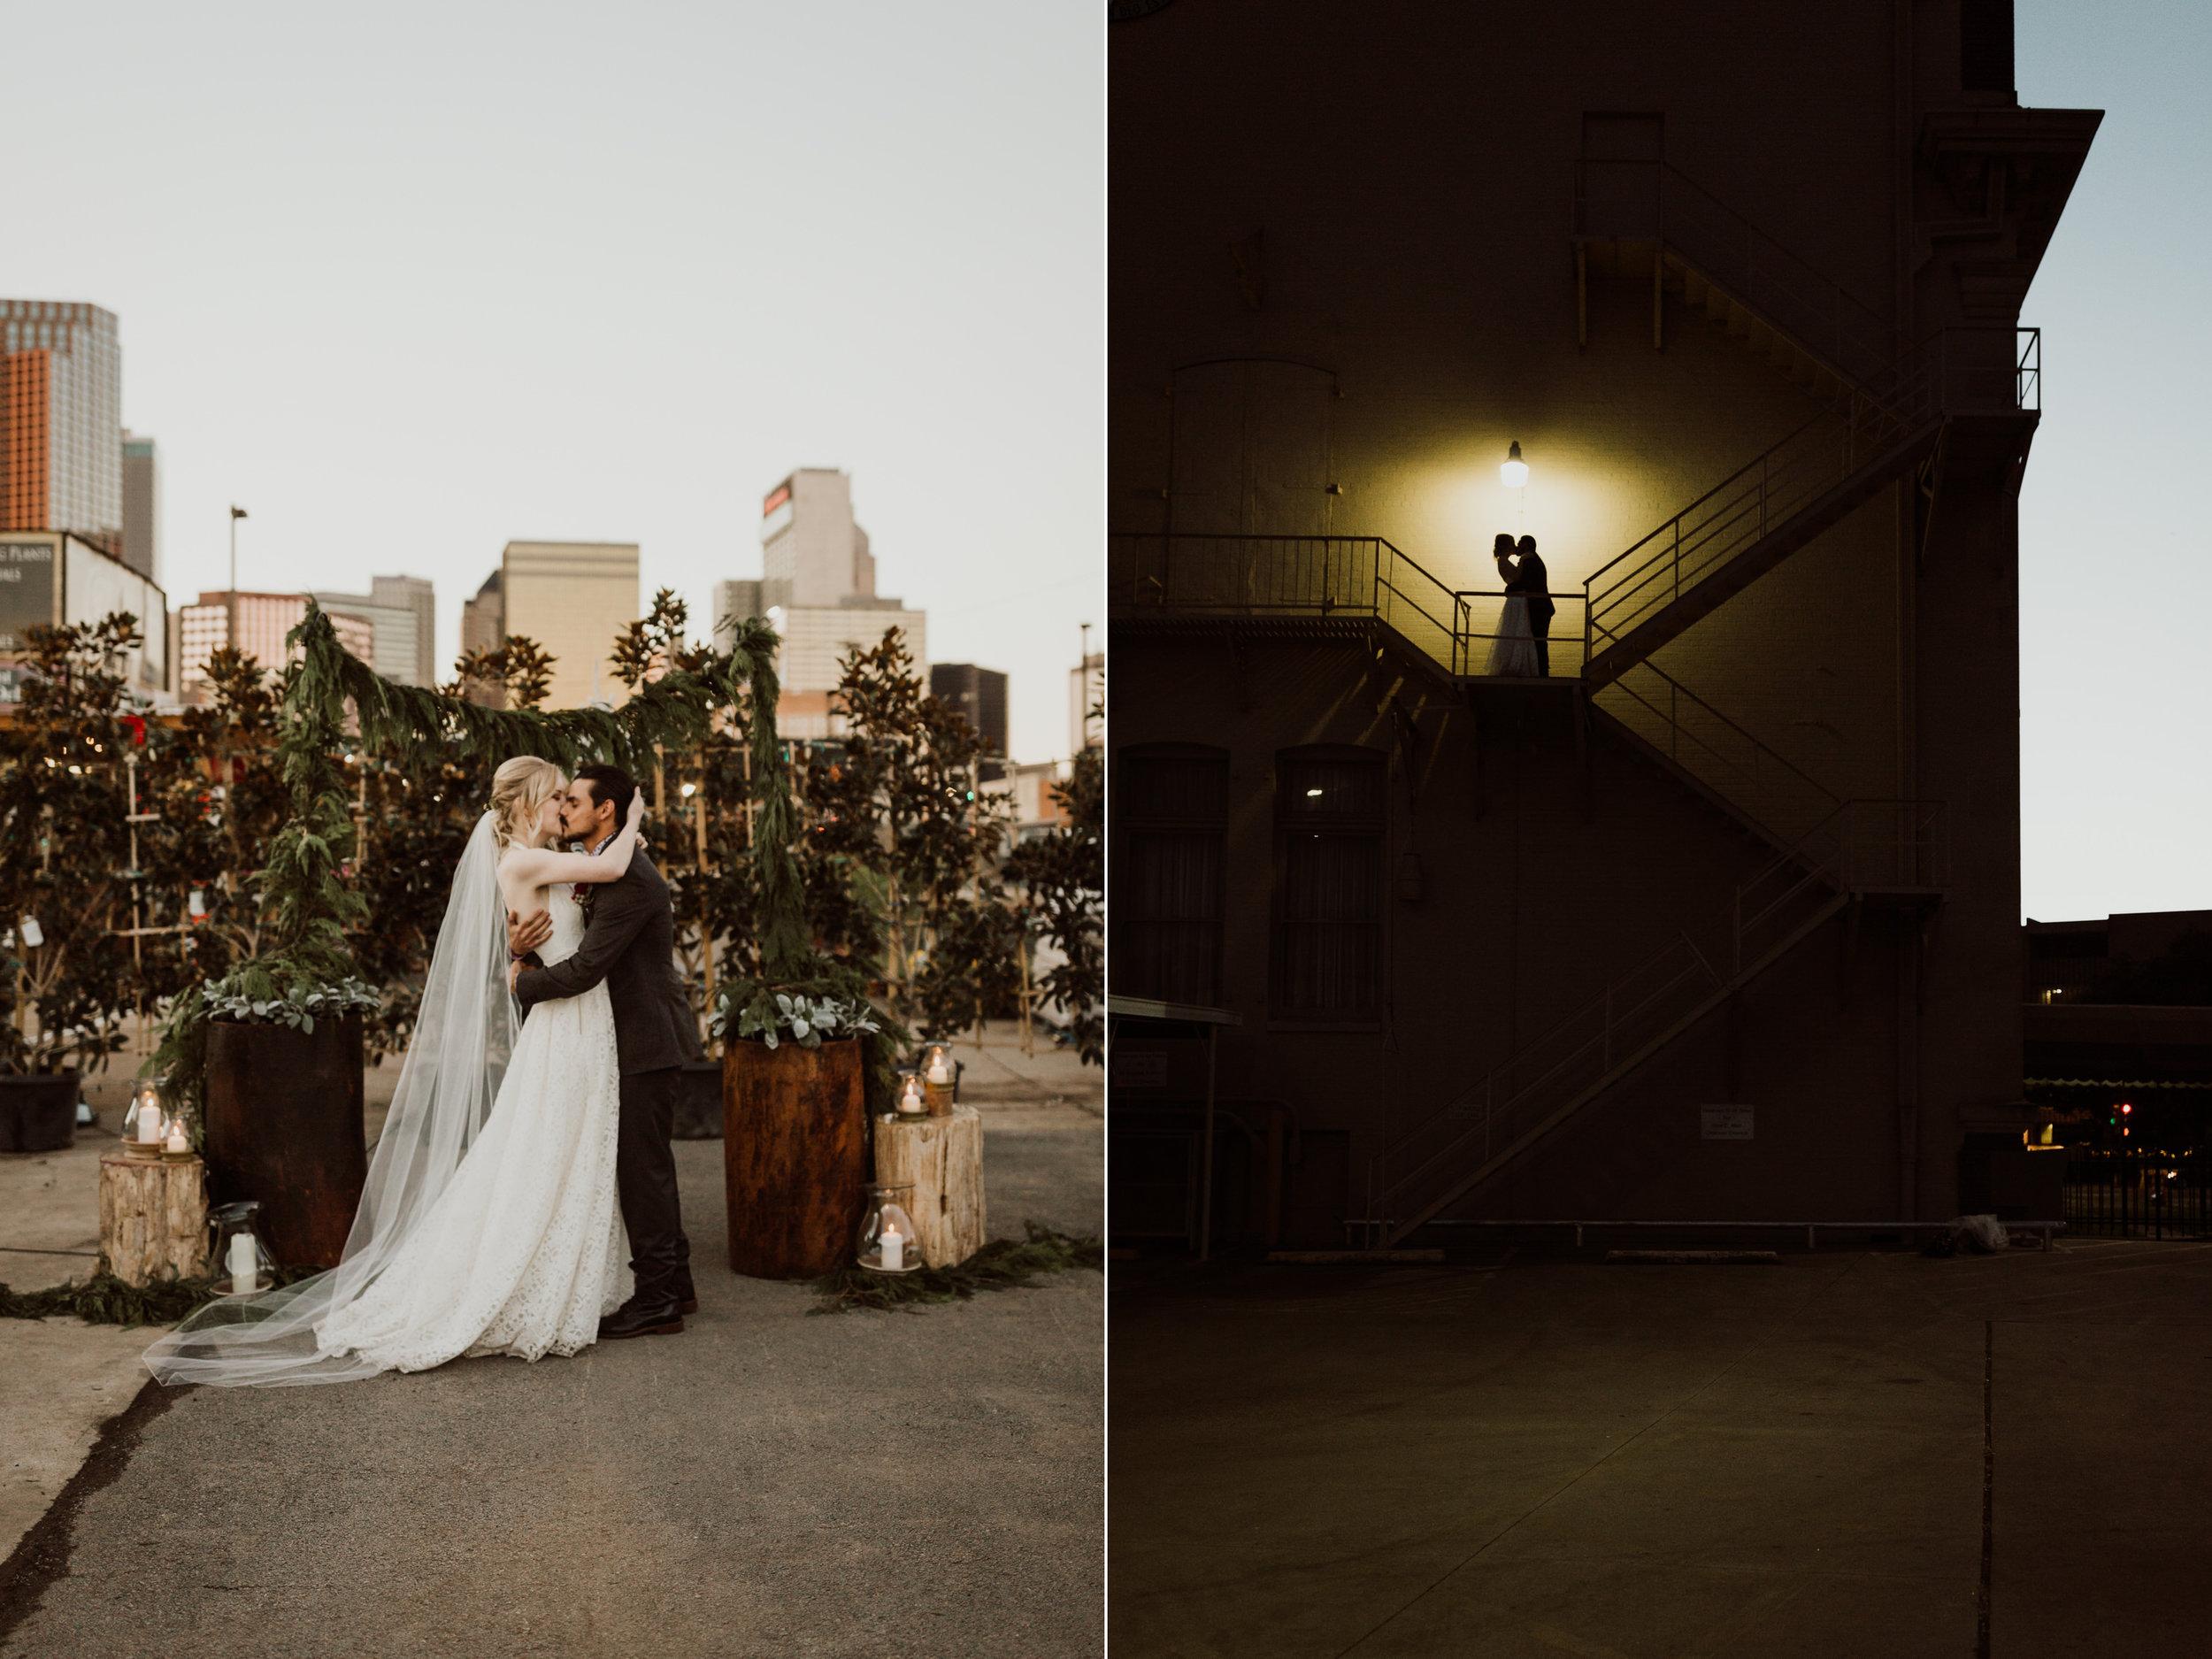 17-12-adventure-wedding-photographer-22.jpg